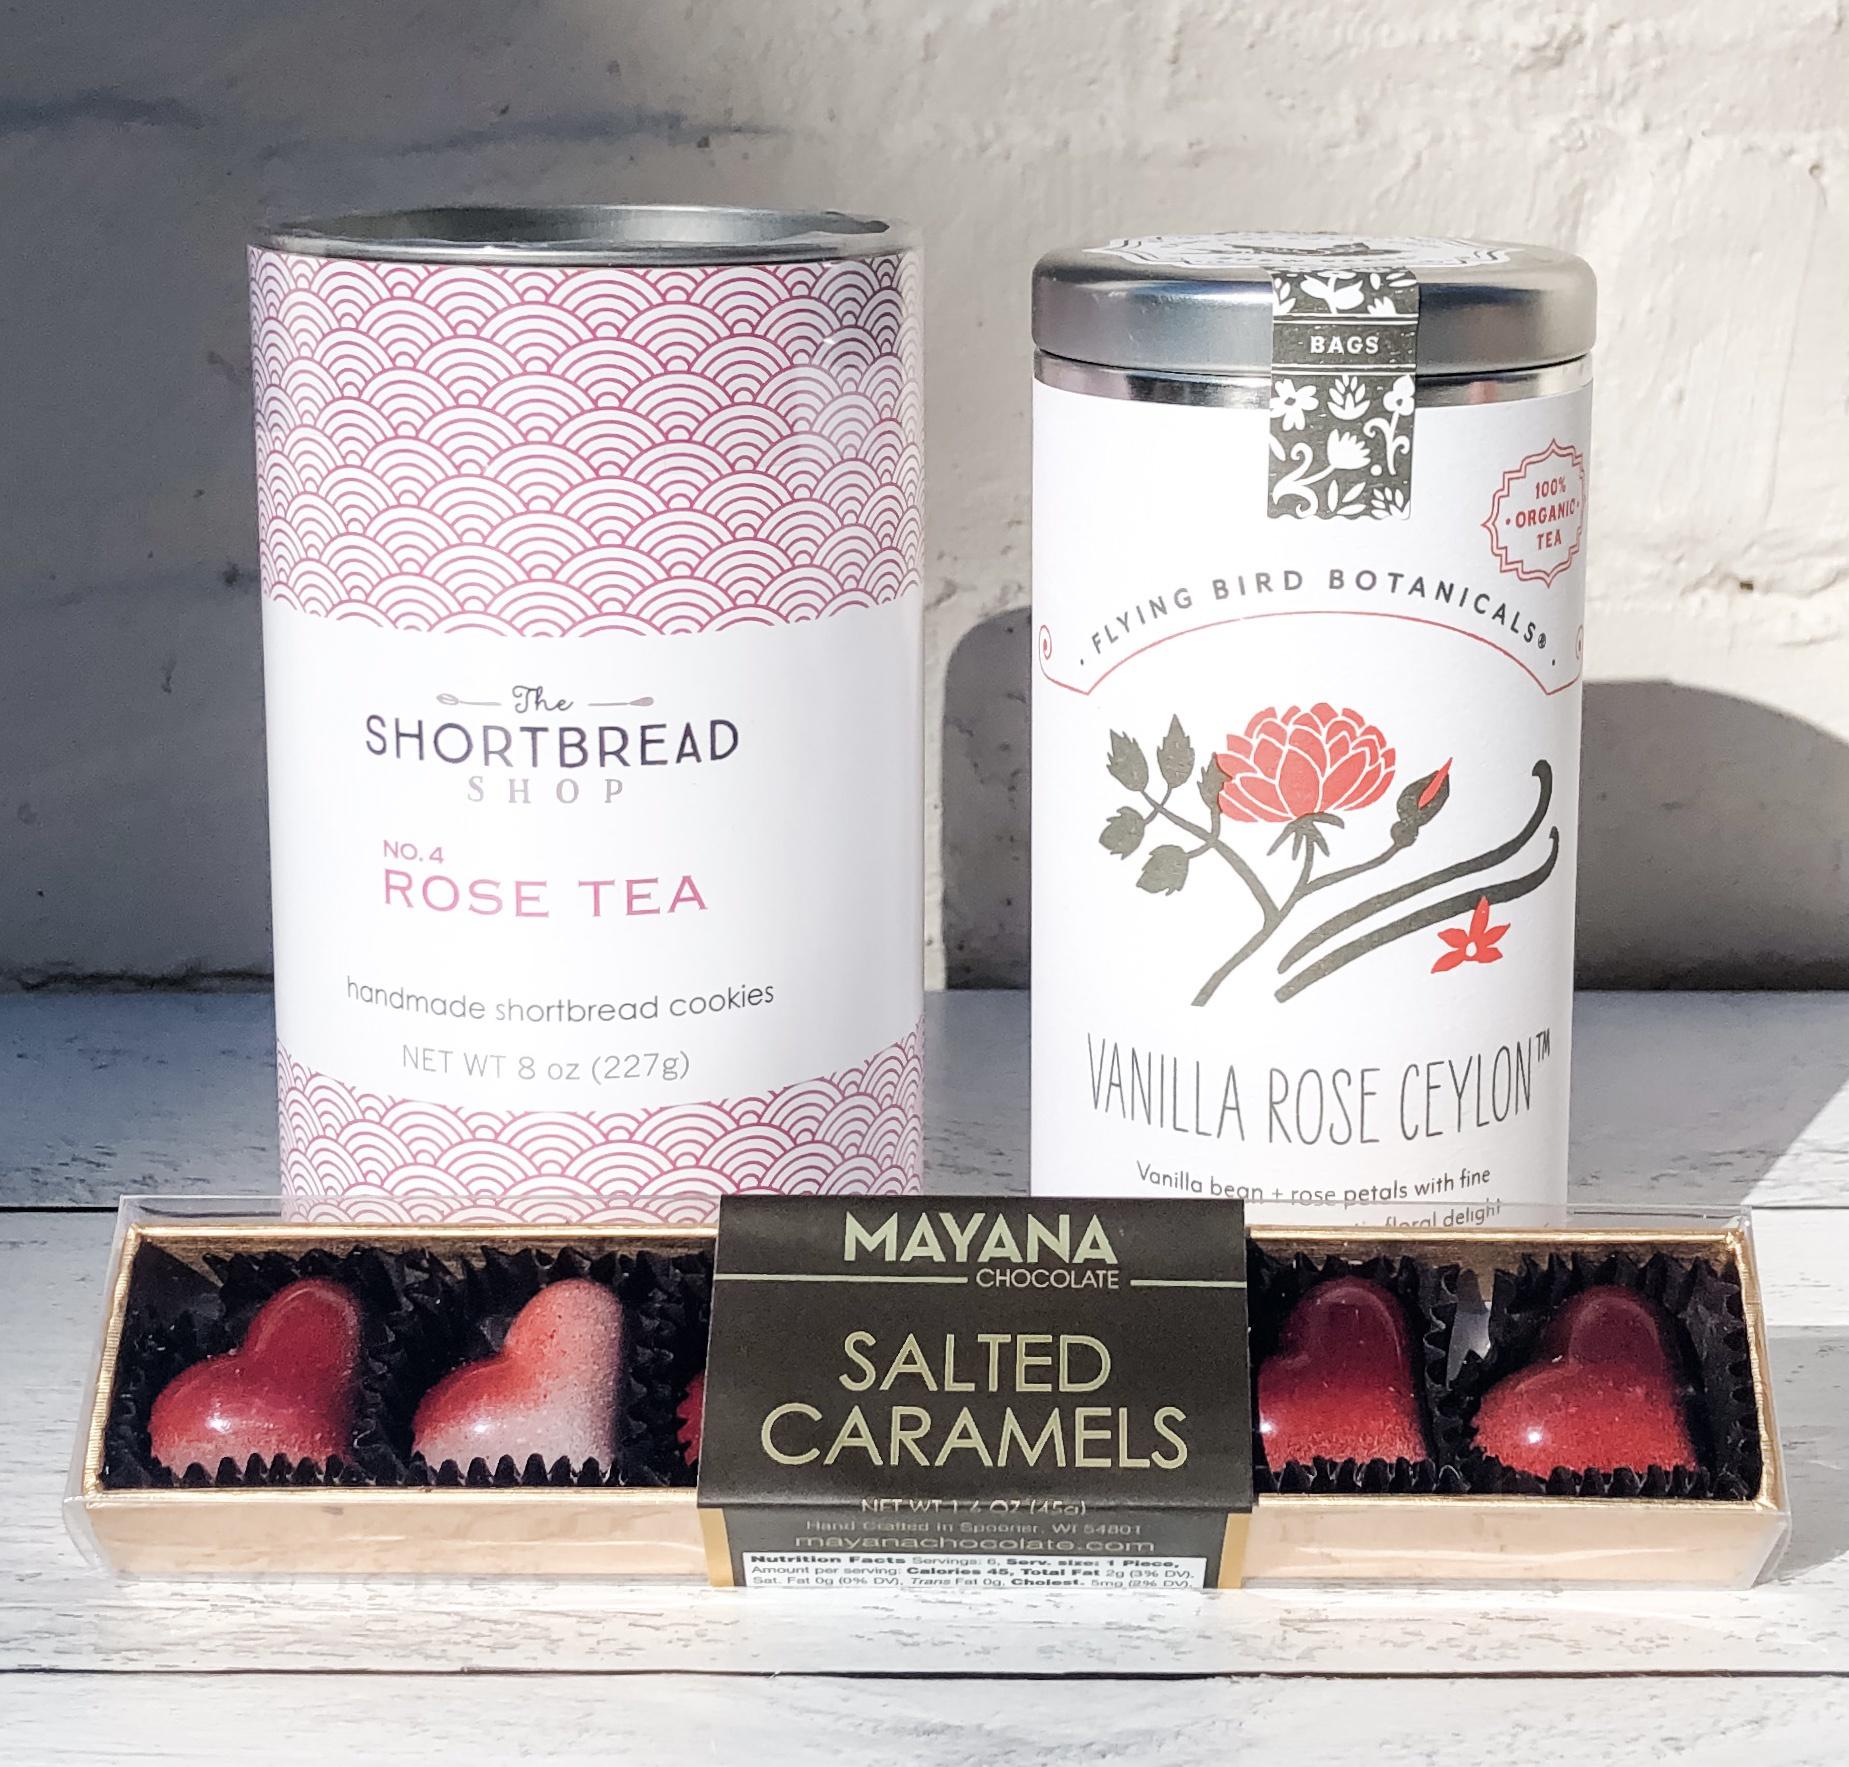 Roses Gift Set: Rose Tea Shortbread + Vanilla Rose Ceylon Tea + Salted Caramel Hearts